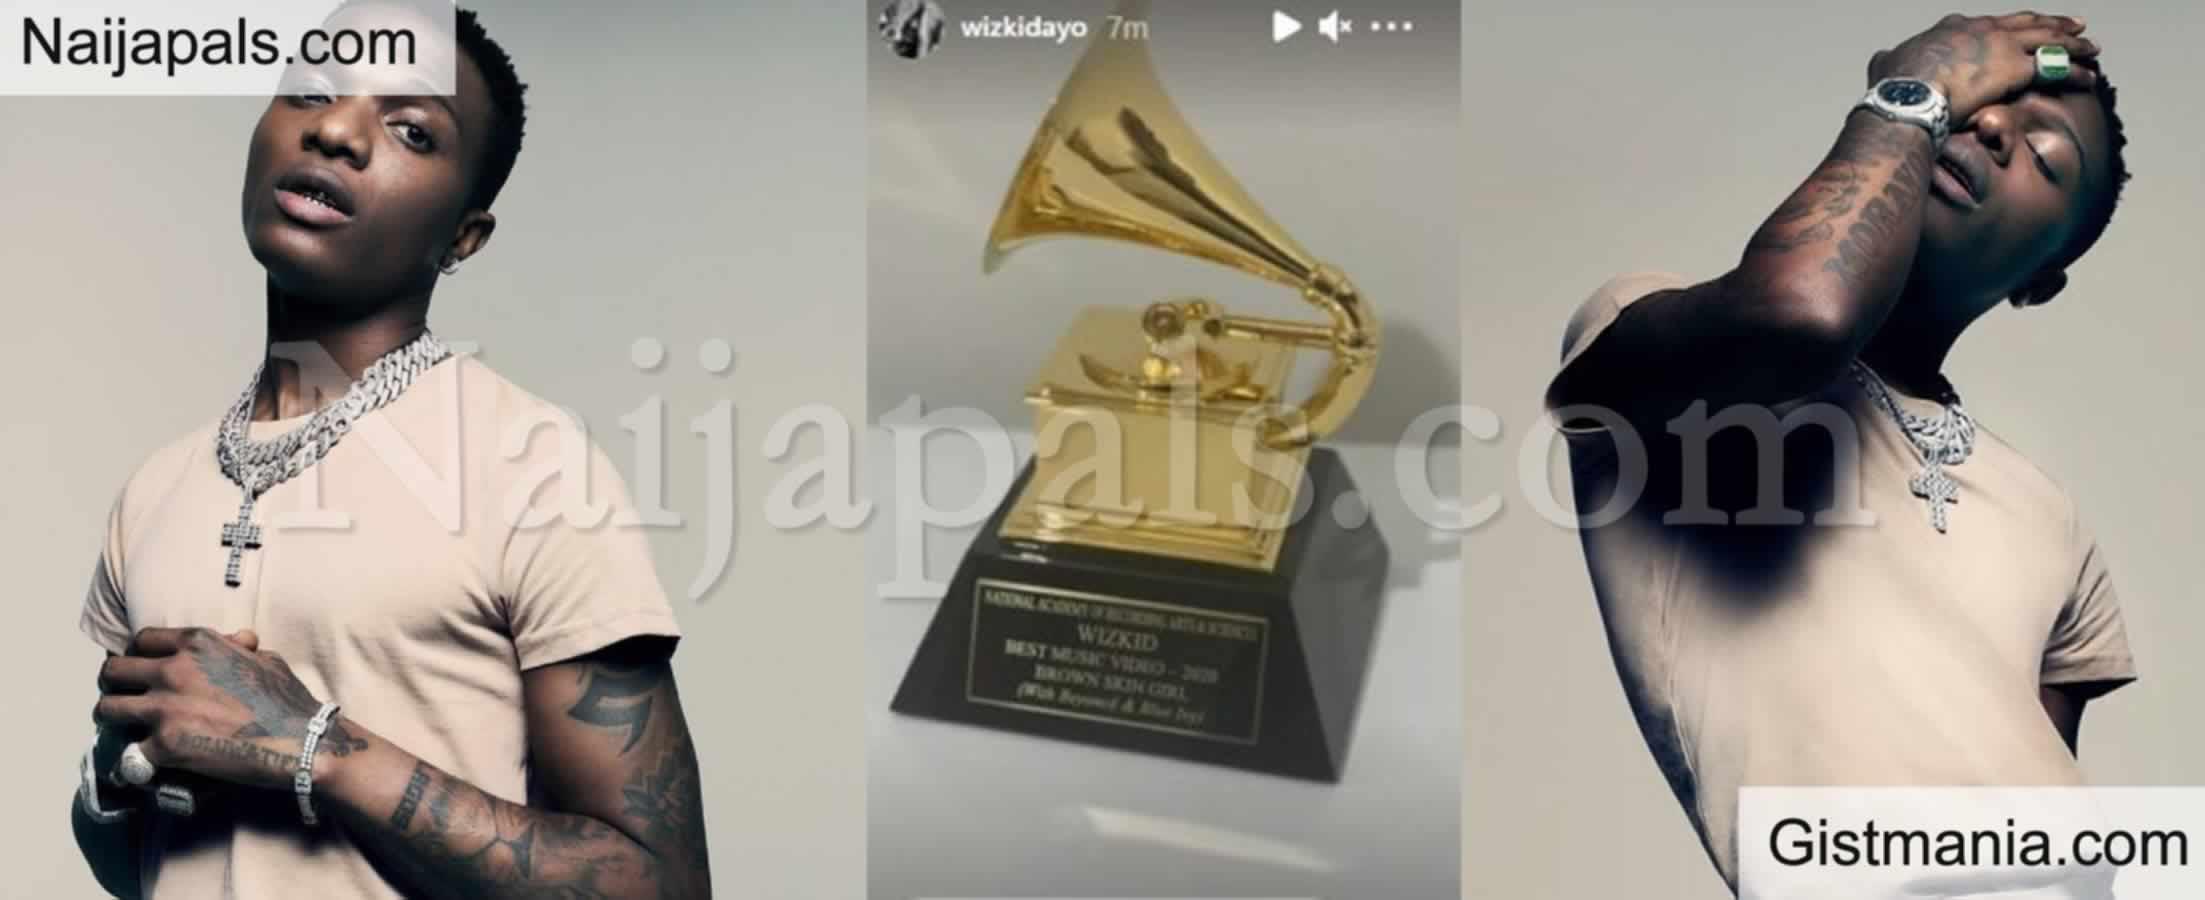 <img alt='.' class='lazyload' data-src='https://img.gistmania.com/emot/thumbs_up.gif' /> Singer, <b>Wizkid Finally Receives His Grammy Award Plaque </b>(Photo)